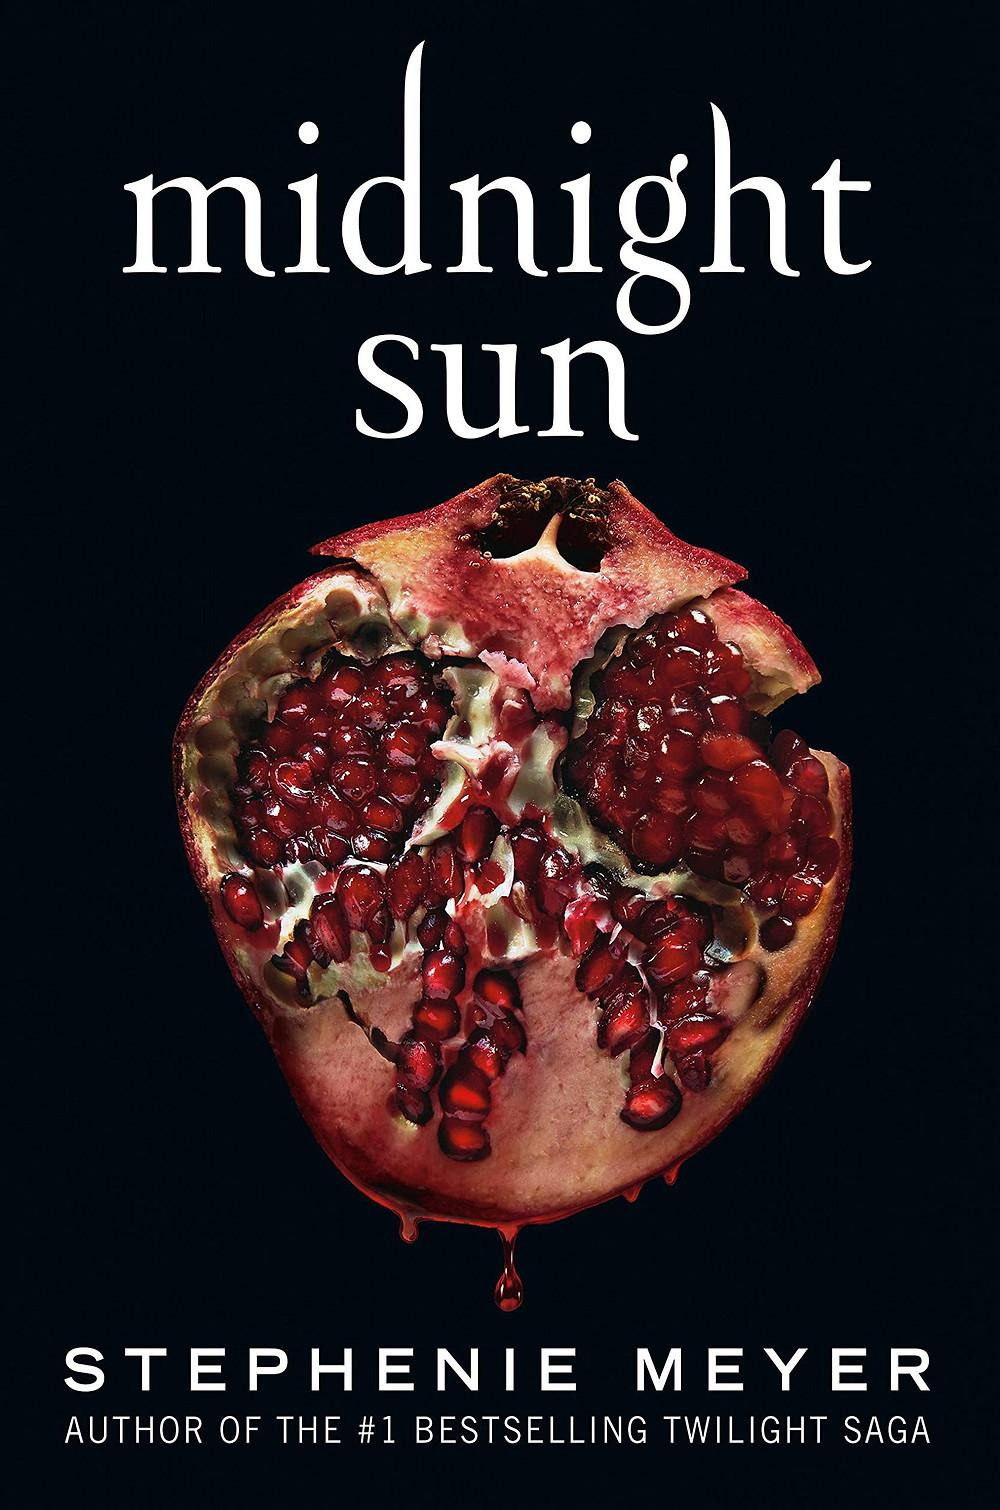 Midnight Sun by Stephenie Meyer | Book Review